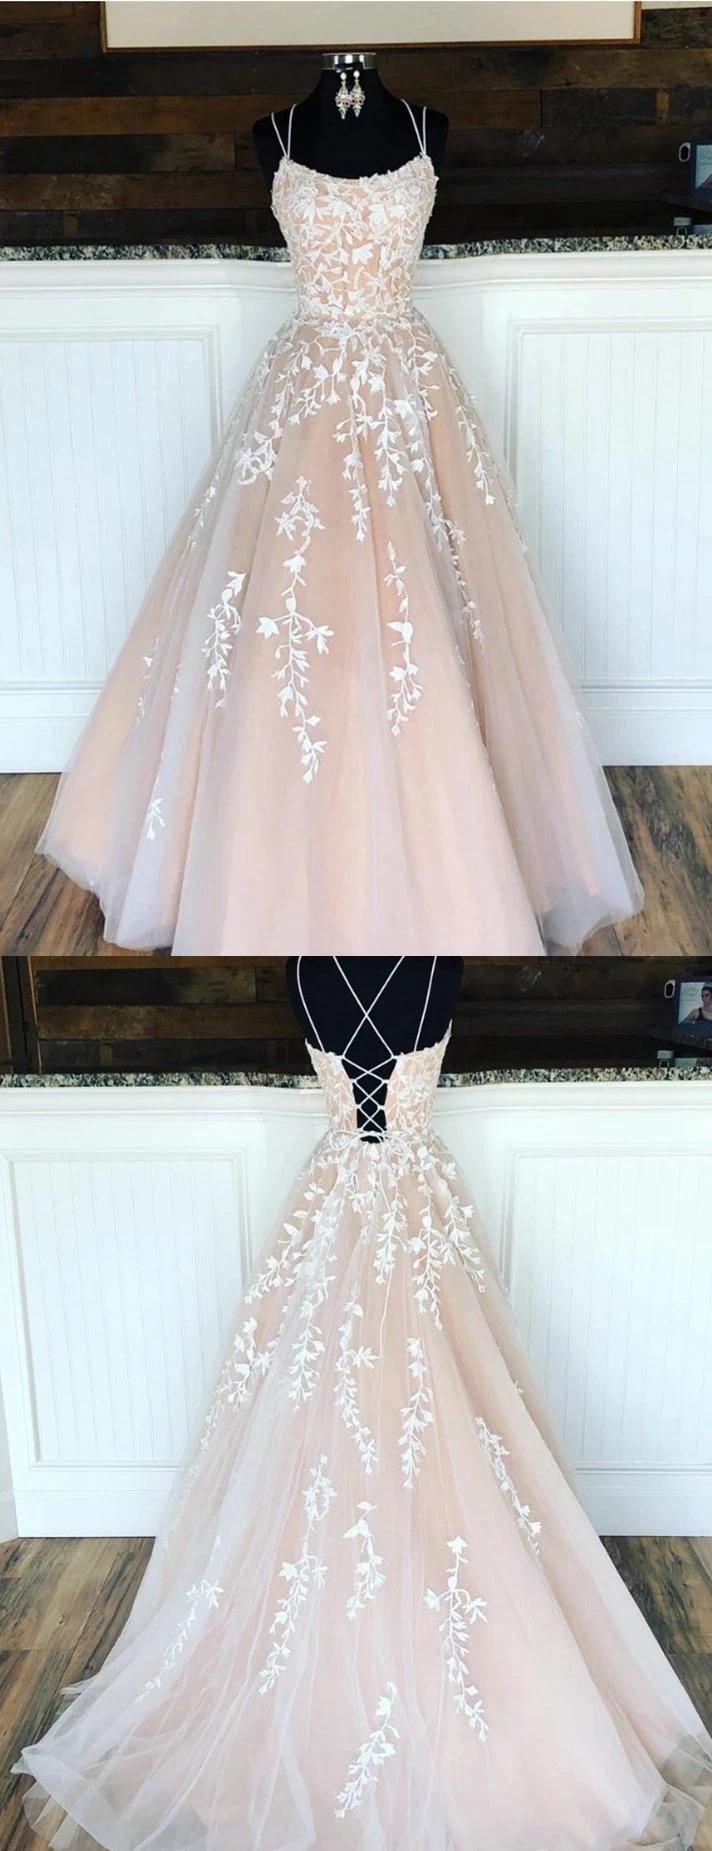 Champagne Prom Dresses Long, Evening Dress ,Winter Formal Dress, Pageant Dance Dresses, Graduation School Party Gown 1374 -   18 dress Winter party ideas